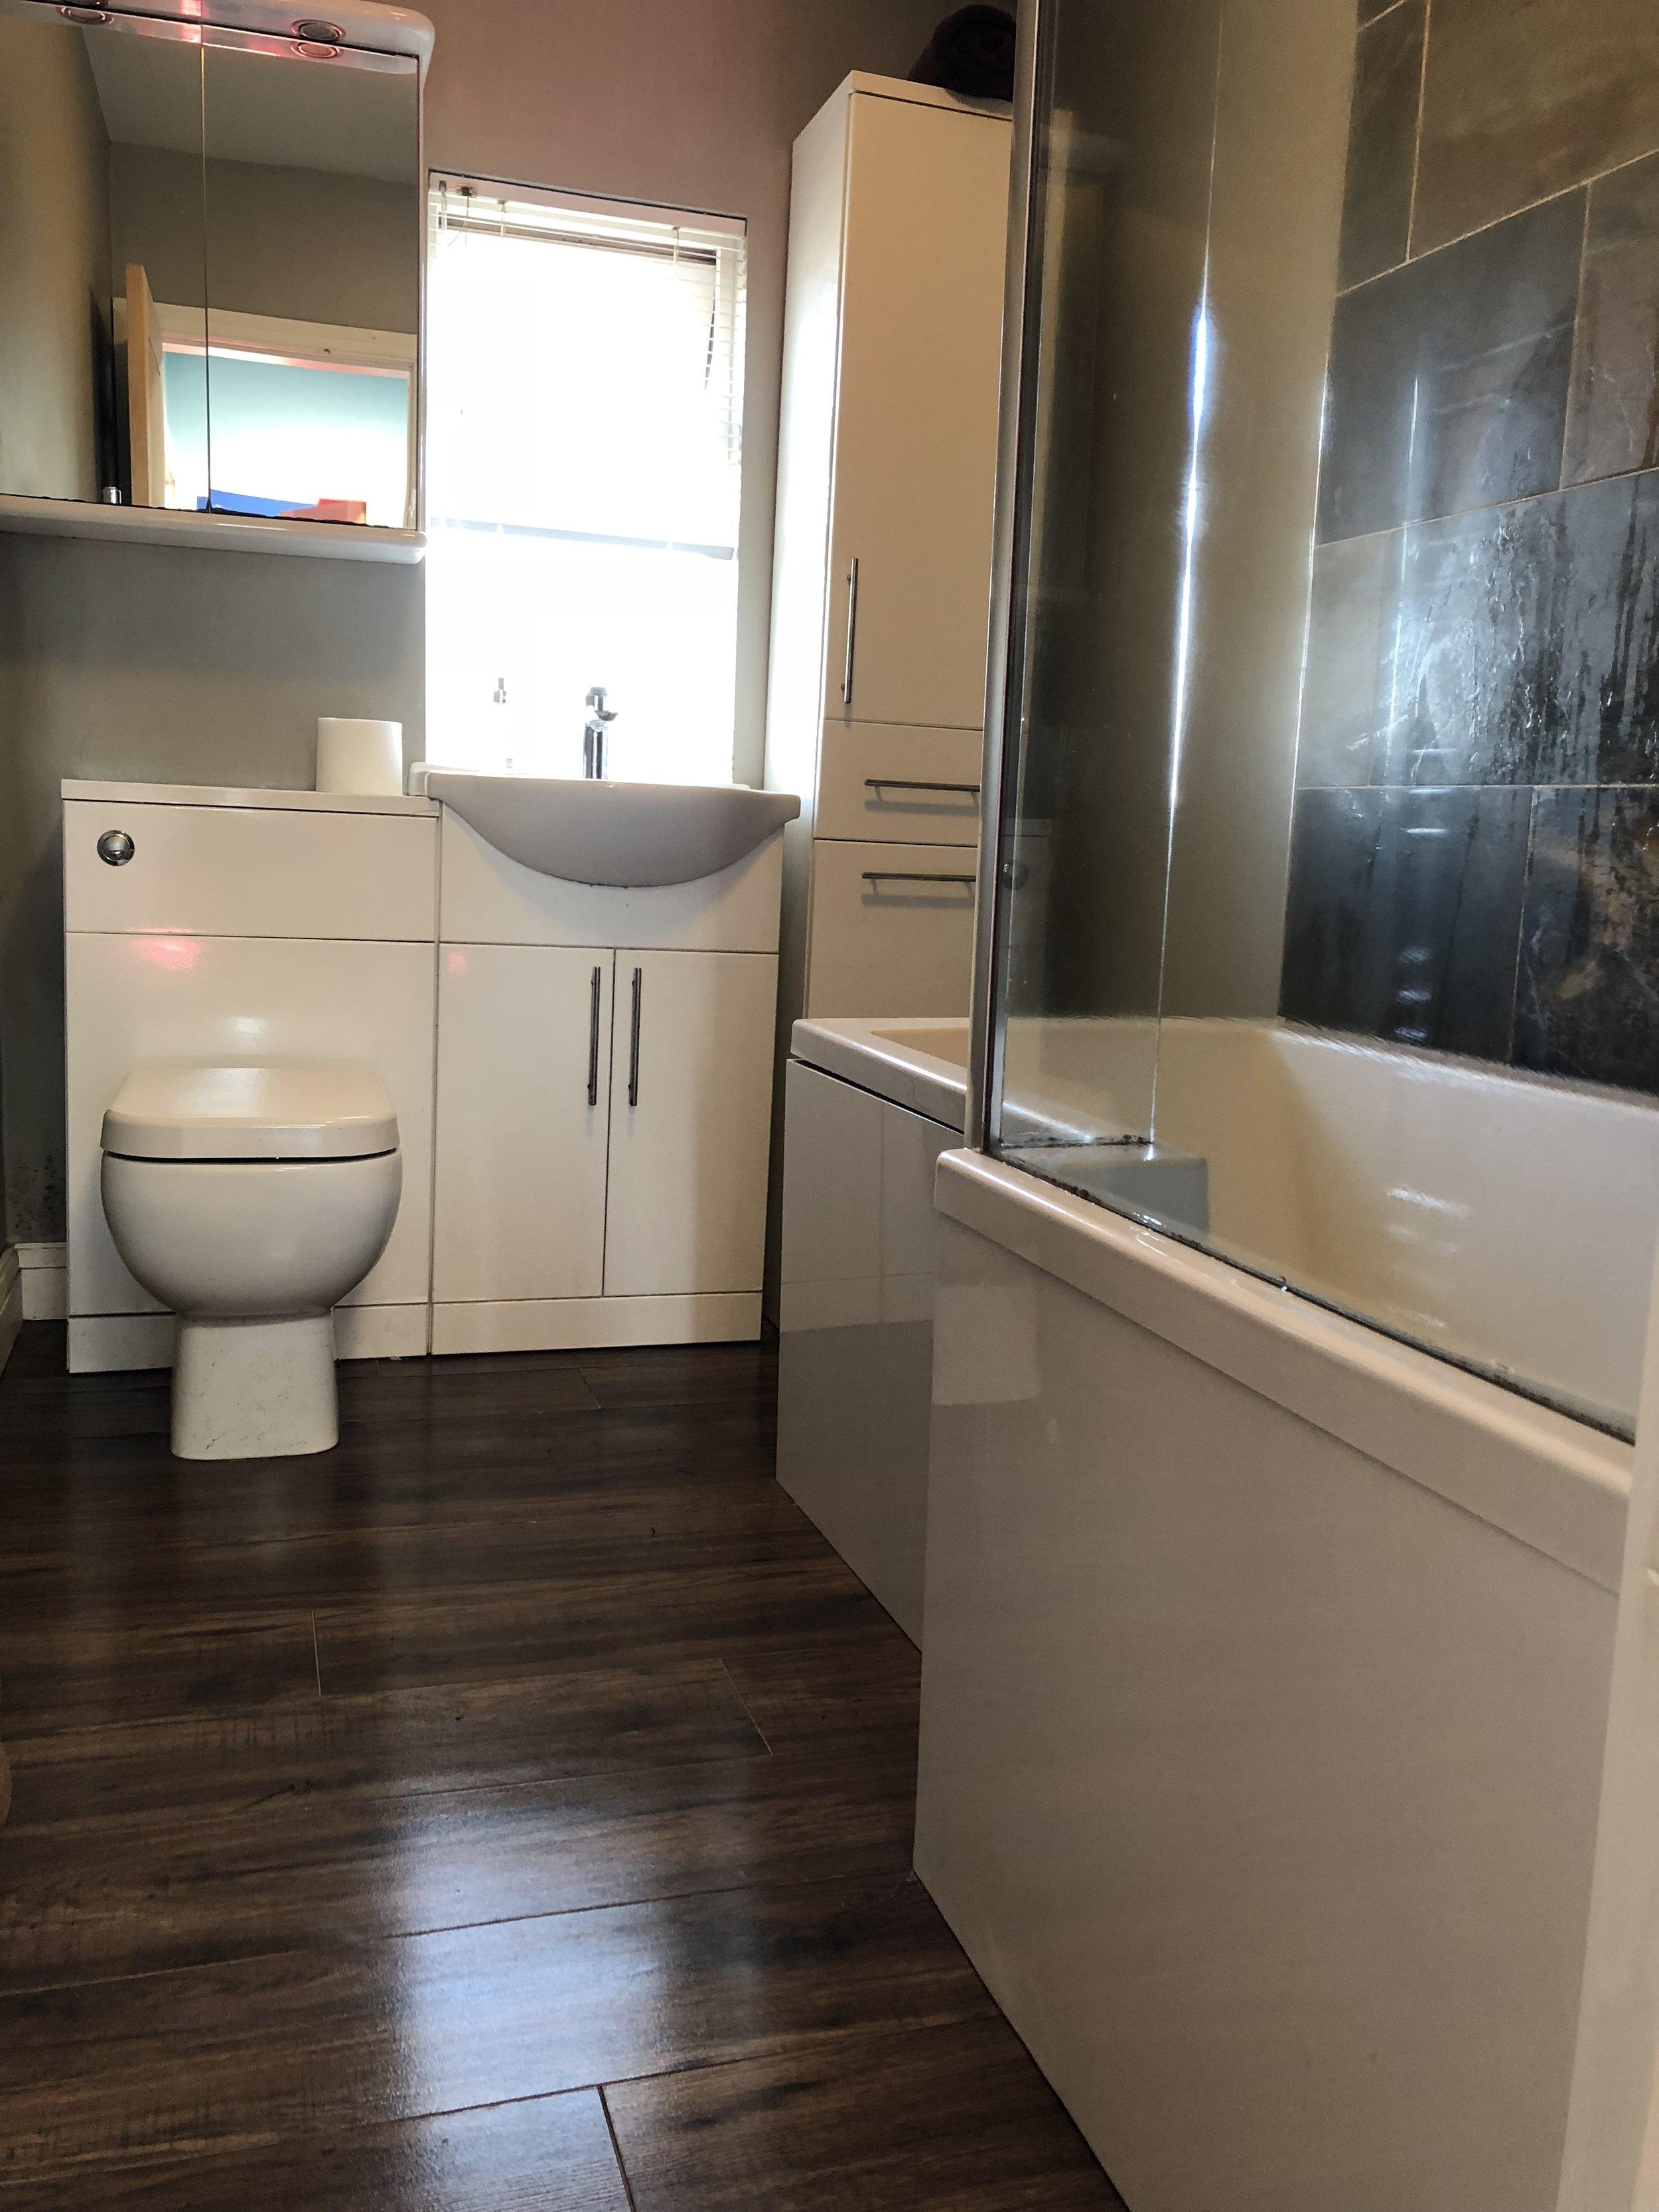 Bathroom with white bathroom suite and dark flooring